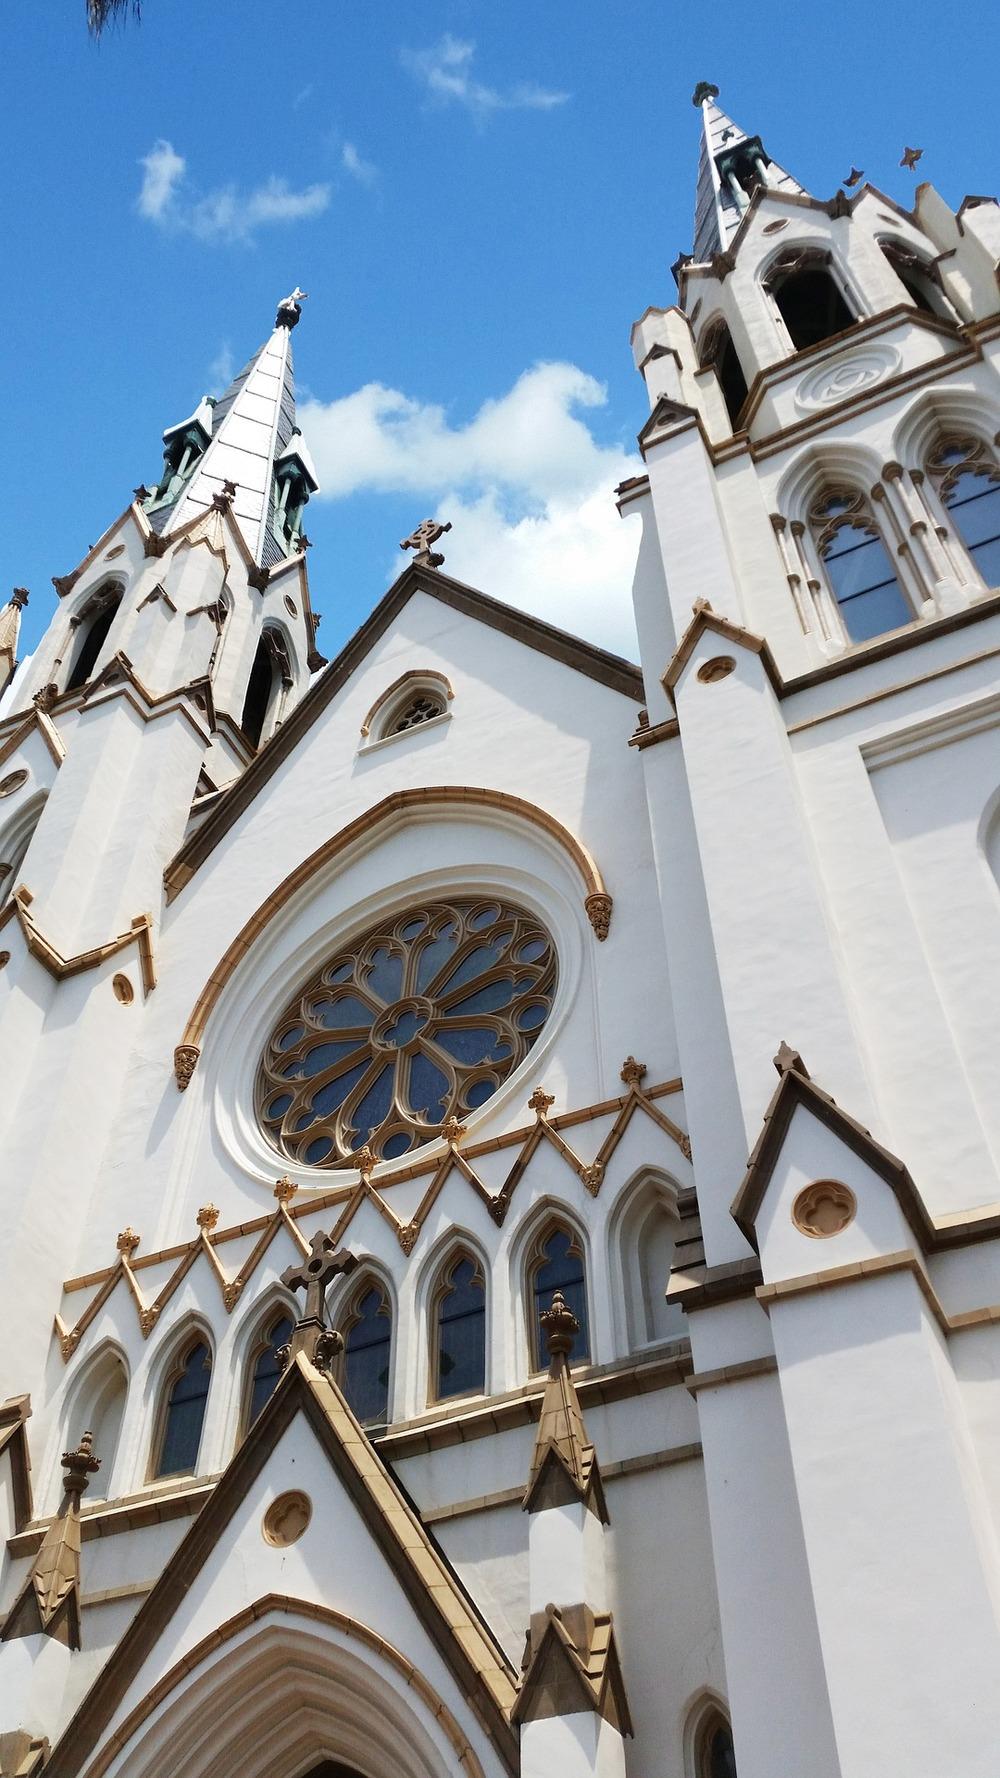 church-869826_1920.jpg